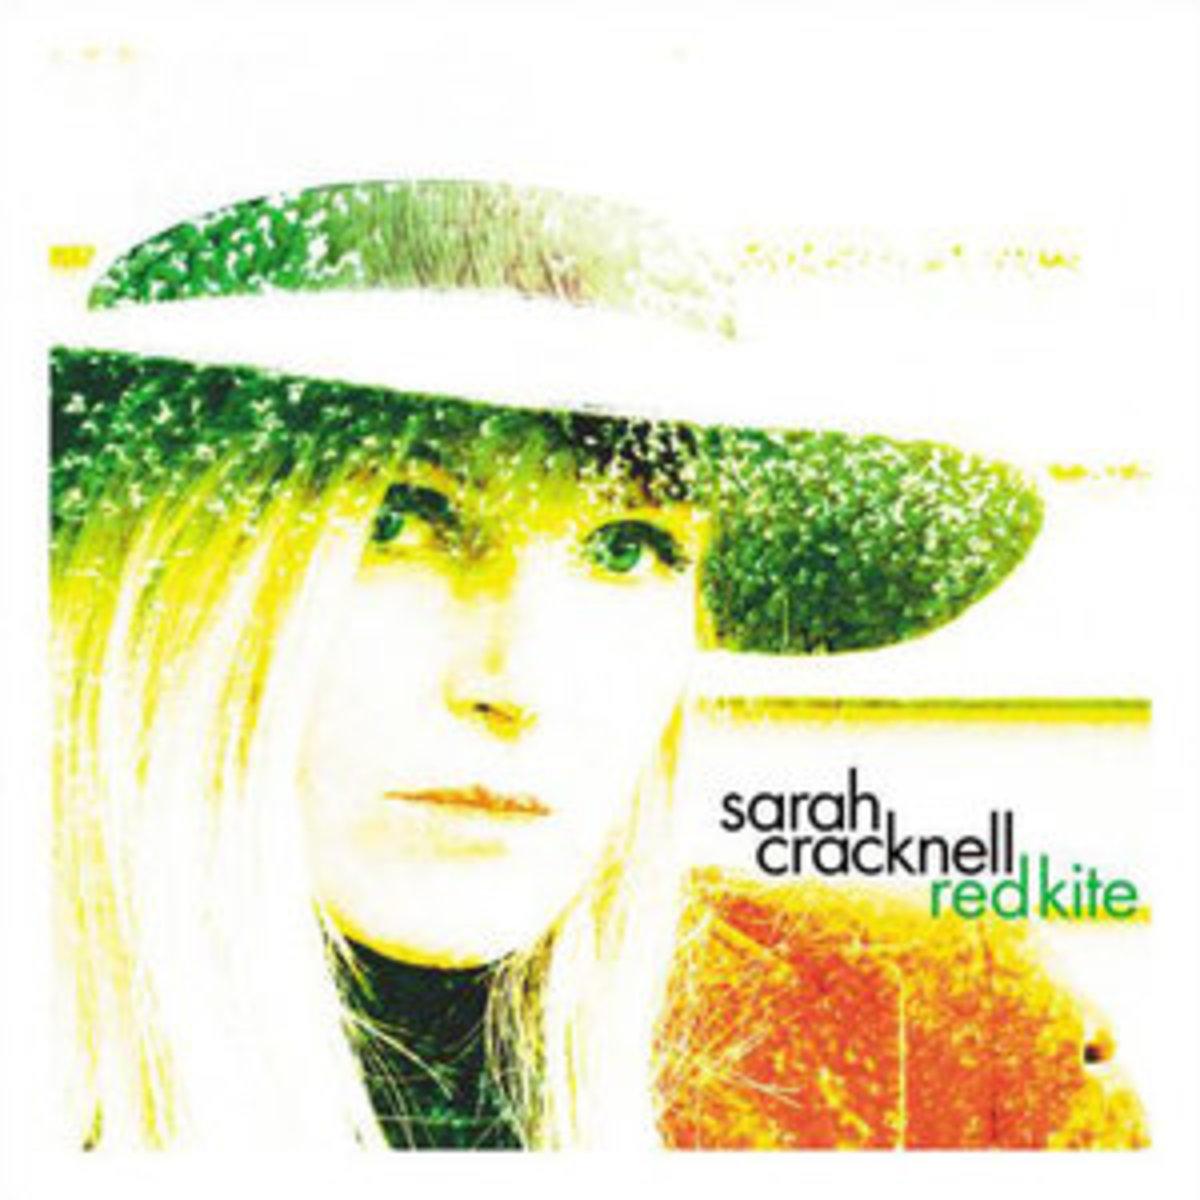 sarah-cracknell---red-kite_sq-5553f4637b1af455329e452f984cc00f1eba1123-s300-c85